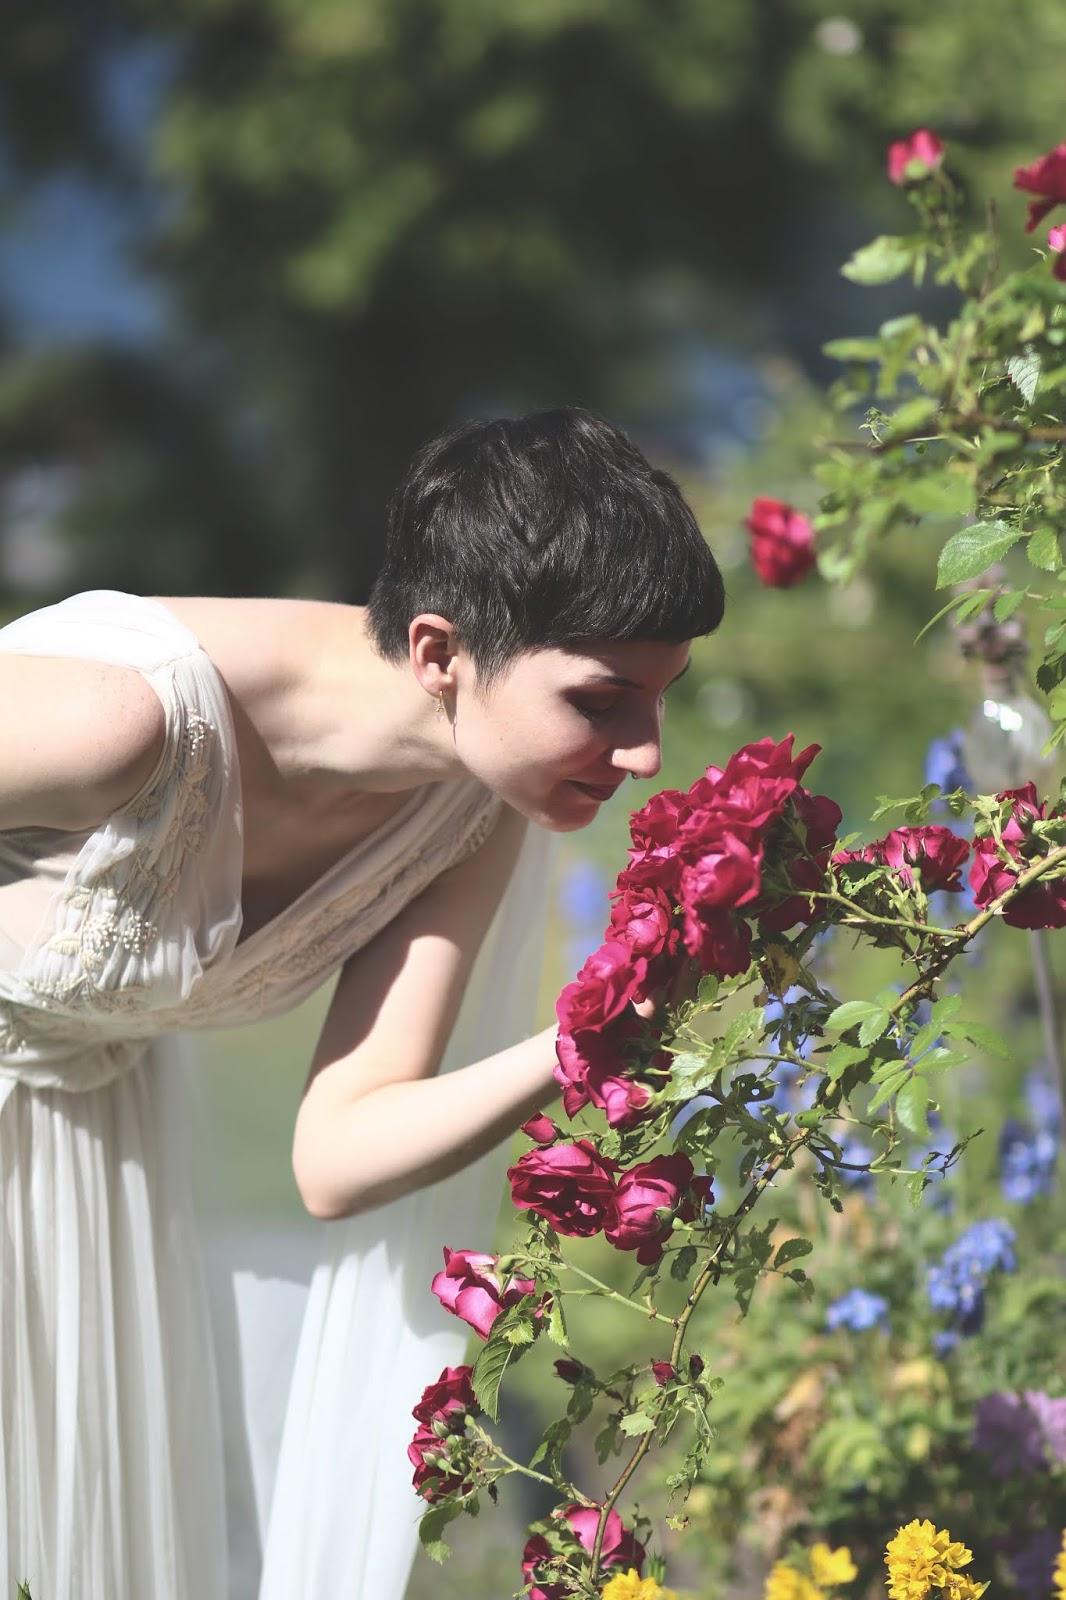 bröllopsfotograf Stockholm, fotograf Härnösand, fotograf Höga kusten, wedding photography, bröllop, fotograf Maria-Thérèse Sommar, afiori, garden, poetic, trädgård, vintage inspired wedding, roses, portrait